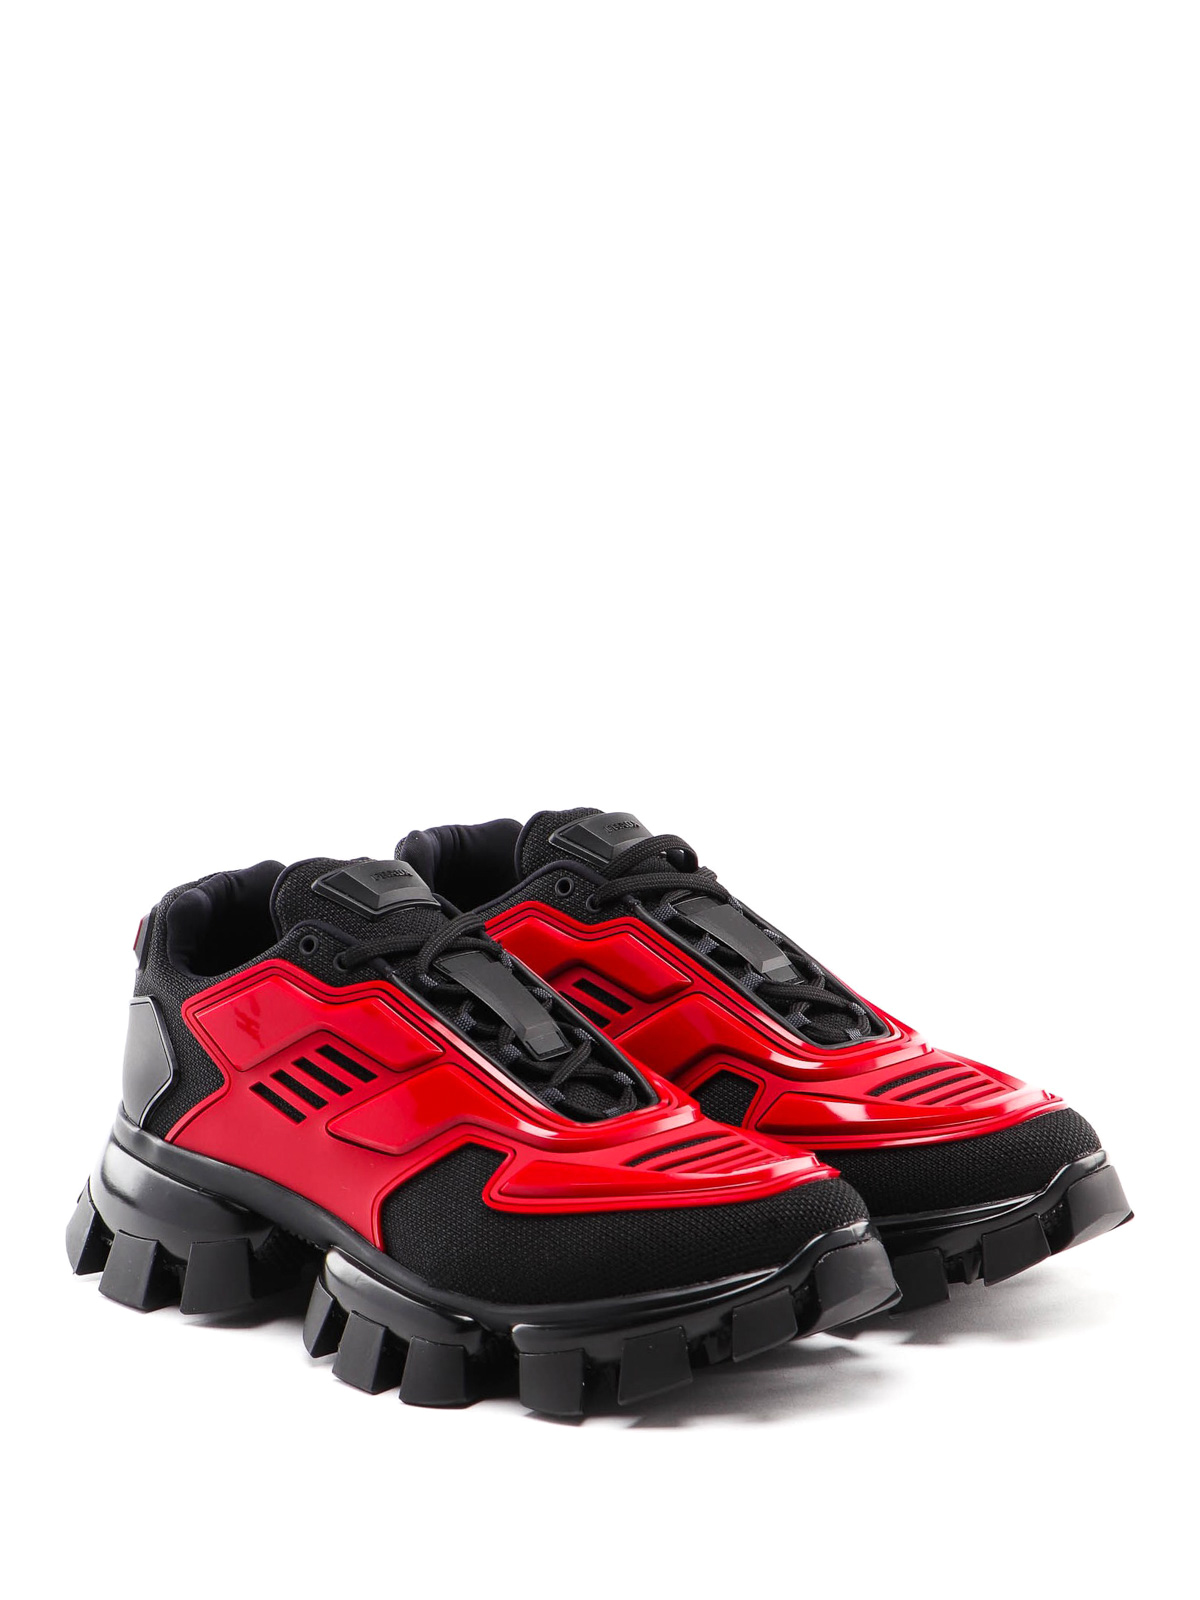 Prada - Cloudbust Thunder red sneakers